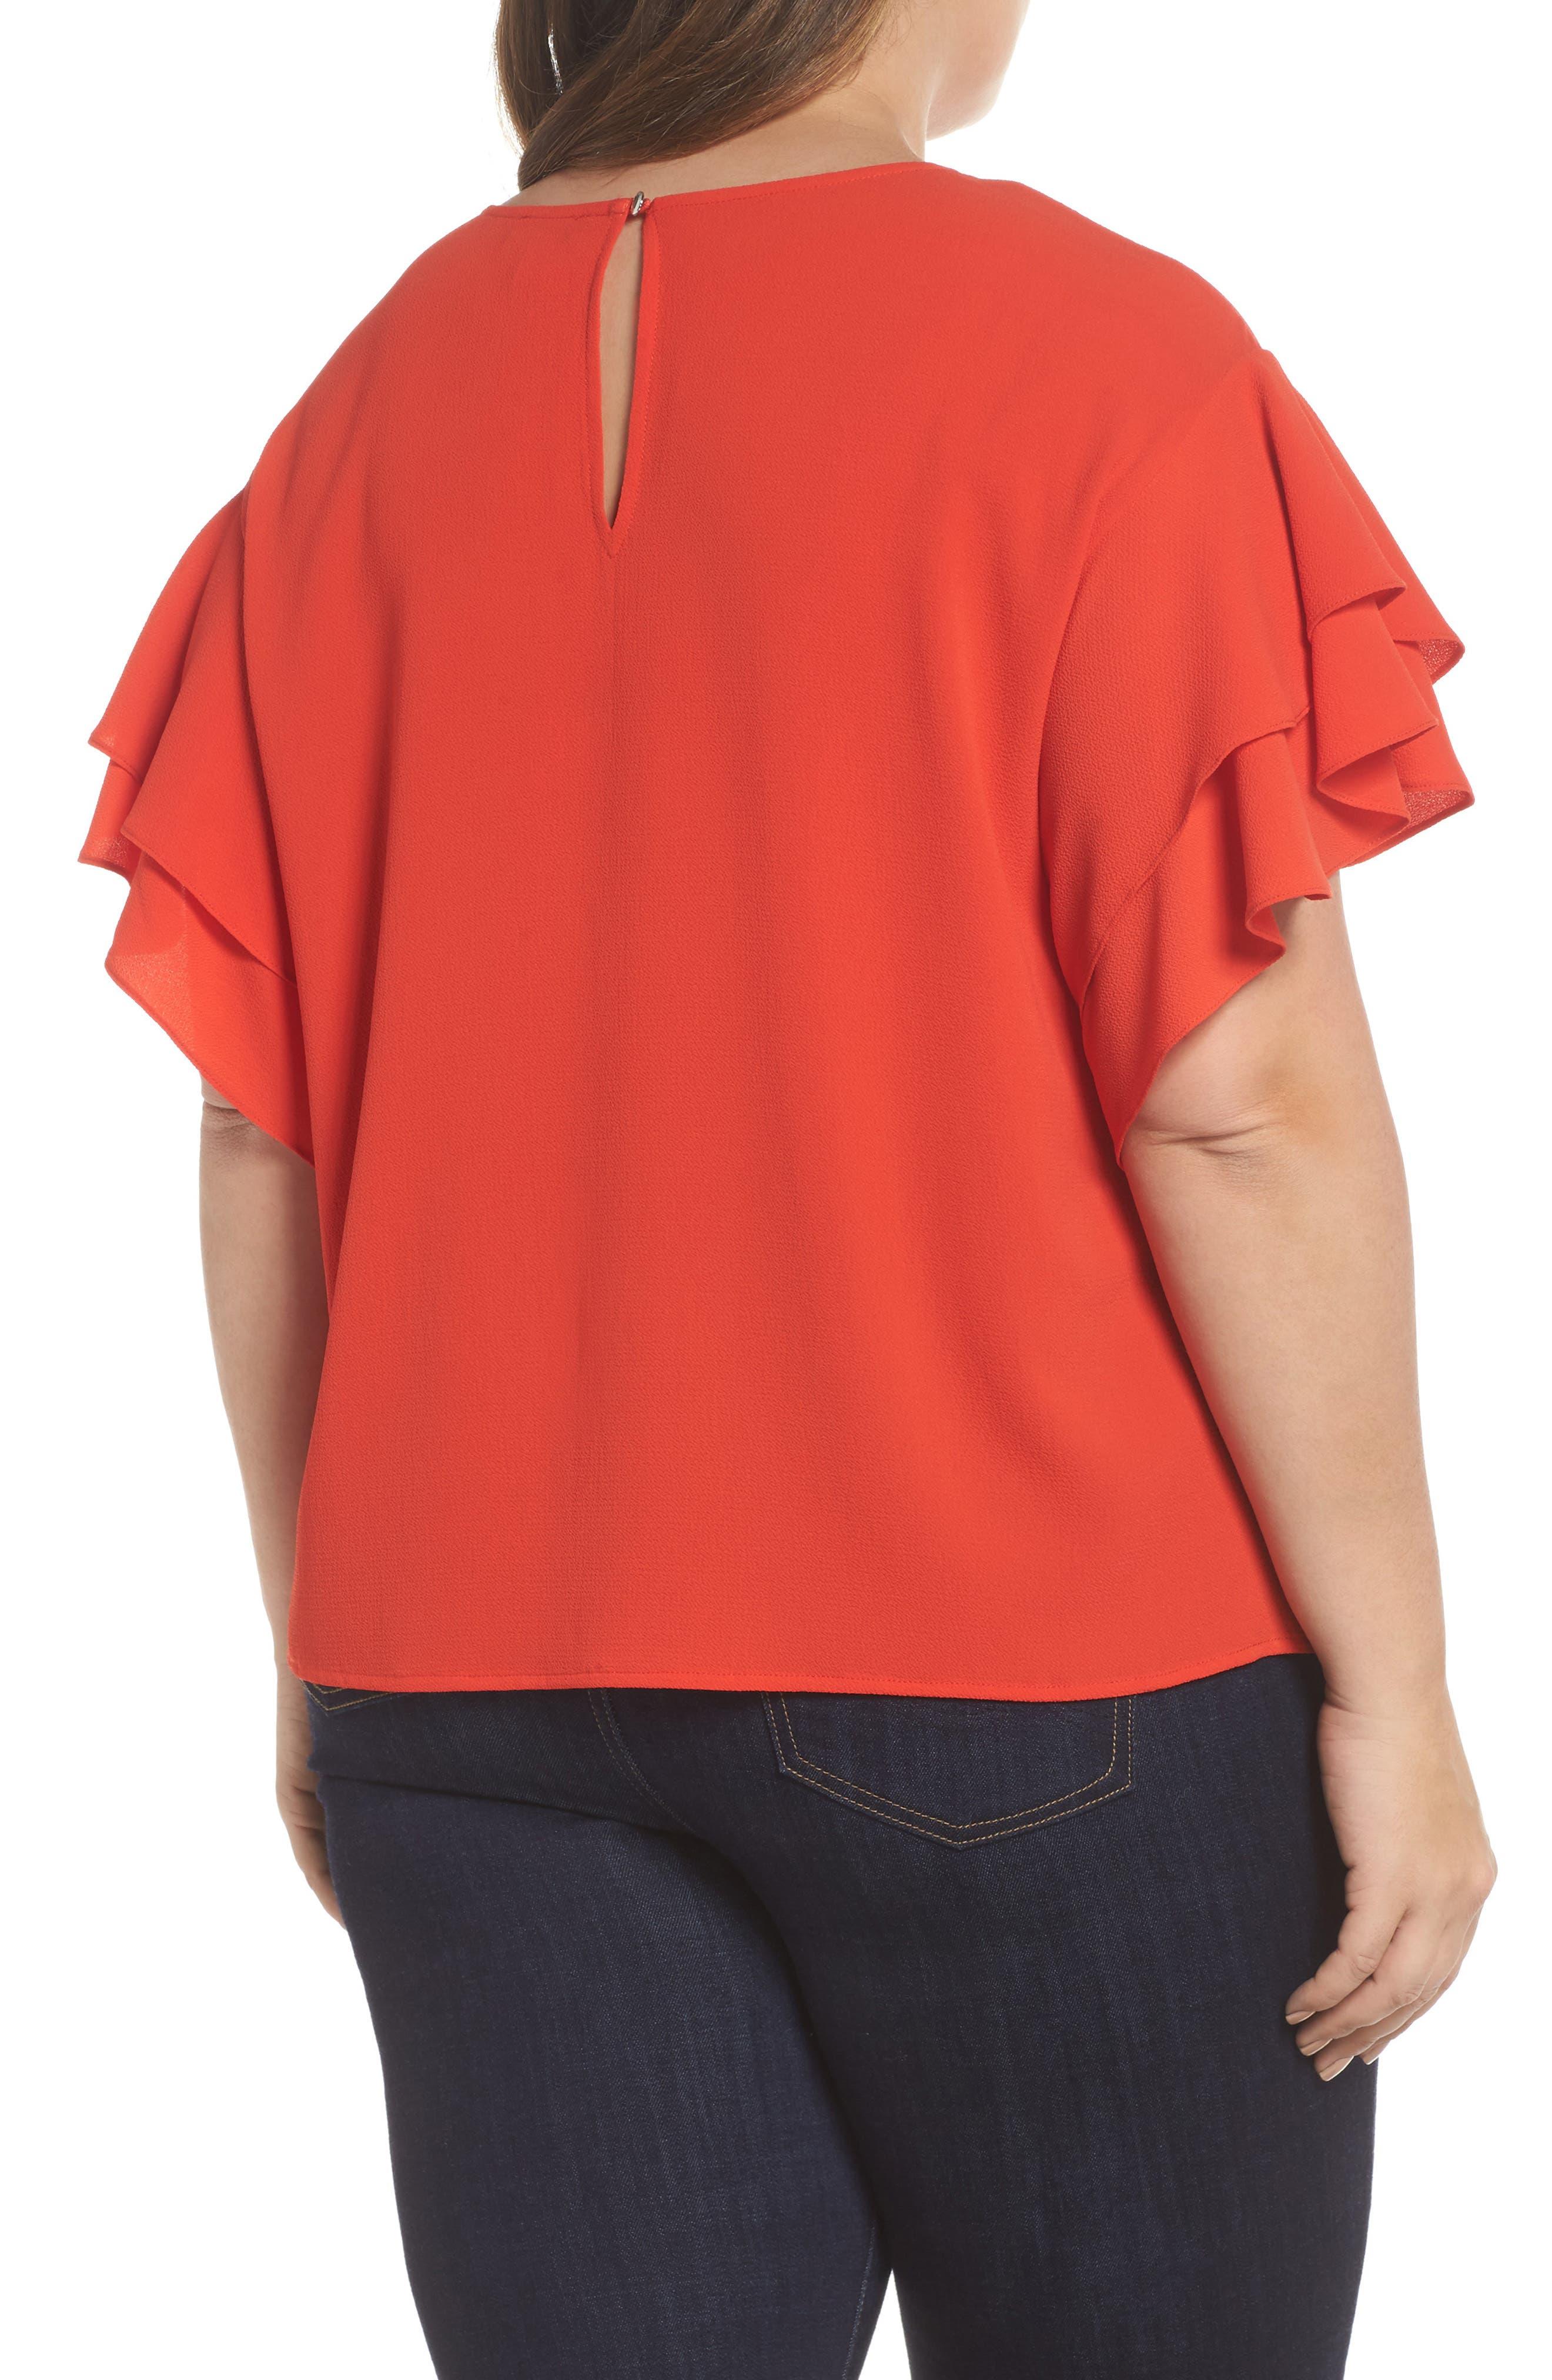 Tiered Ruffle Sleeve Top,                             Alternate thumbnail 2, color,                             Geranium